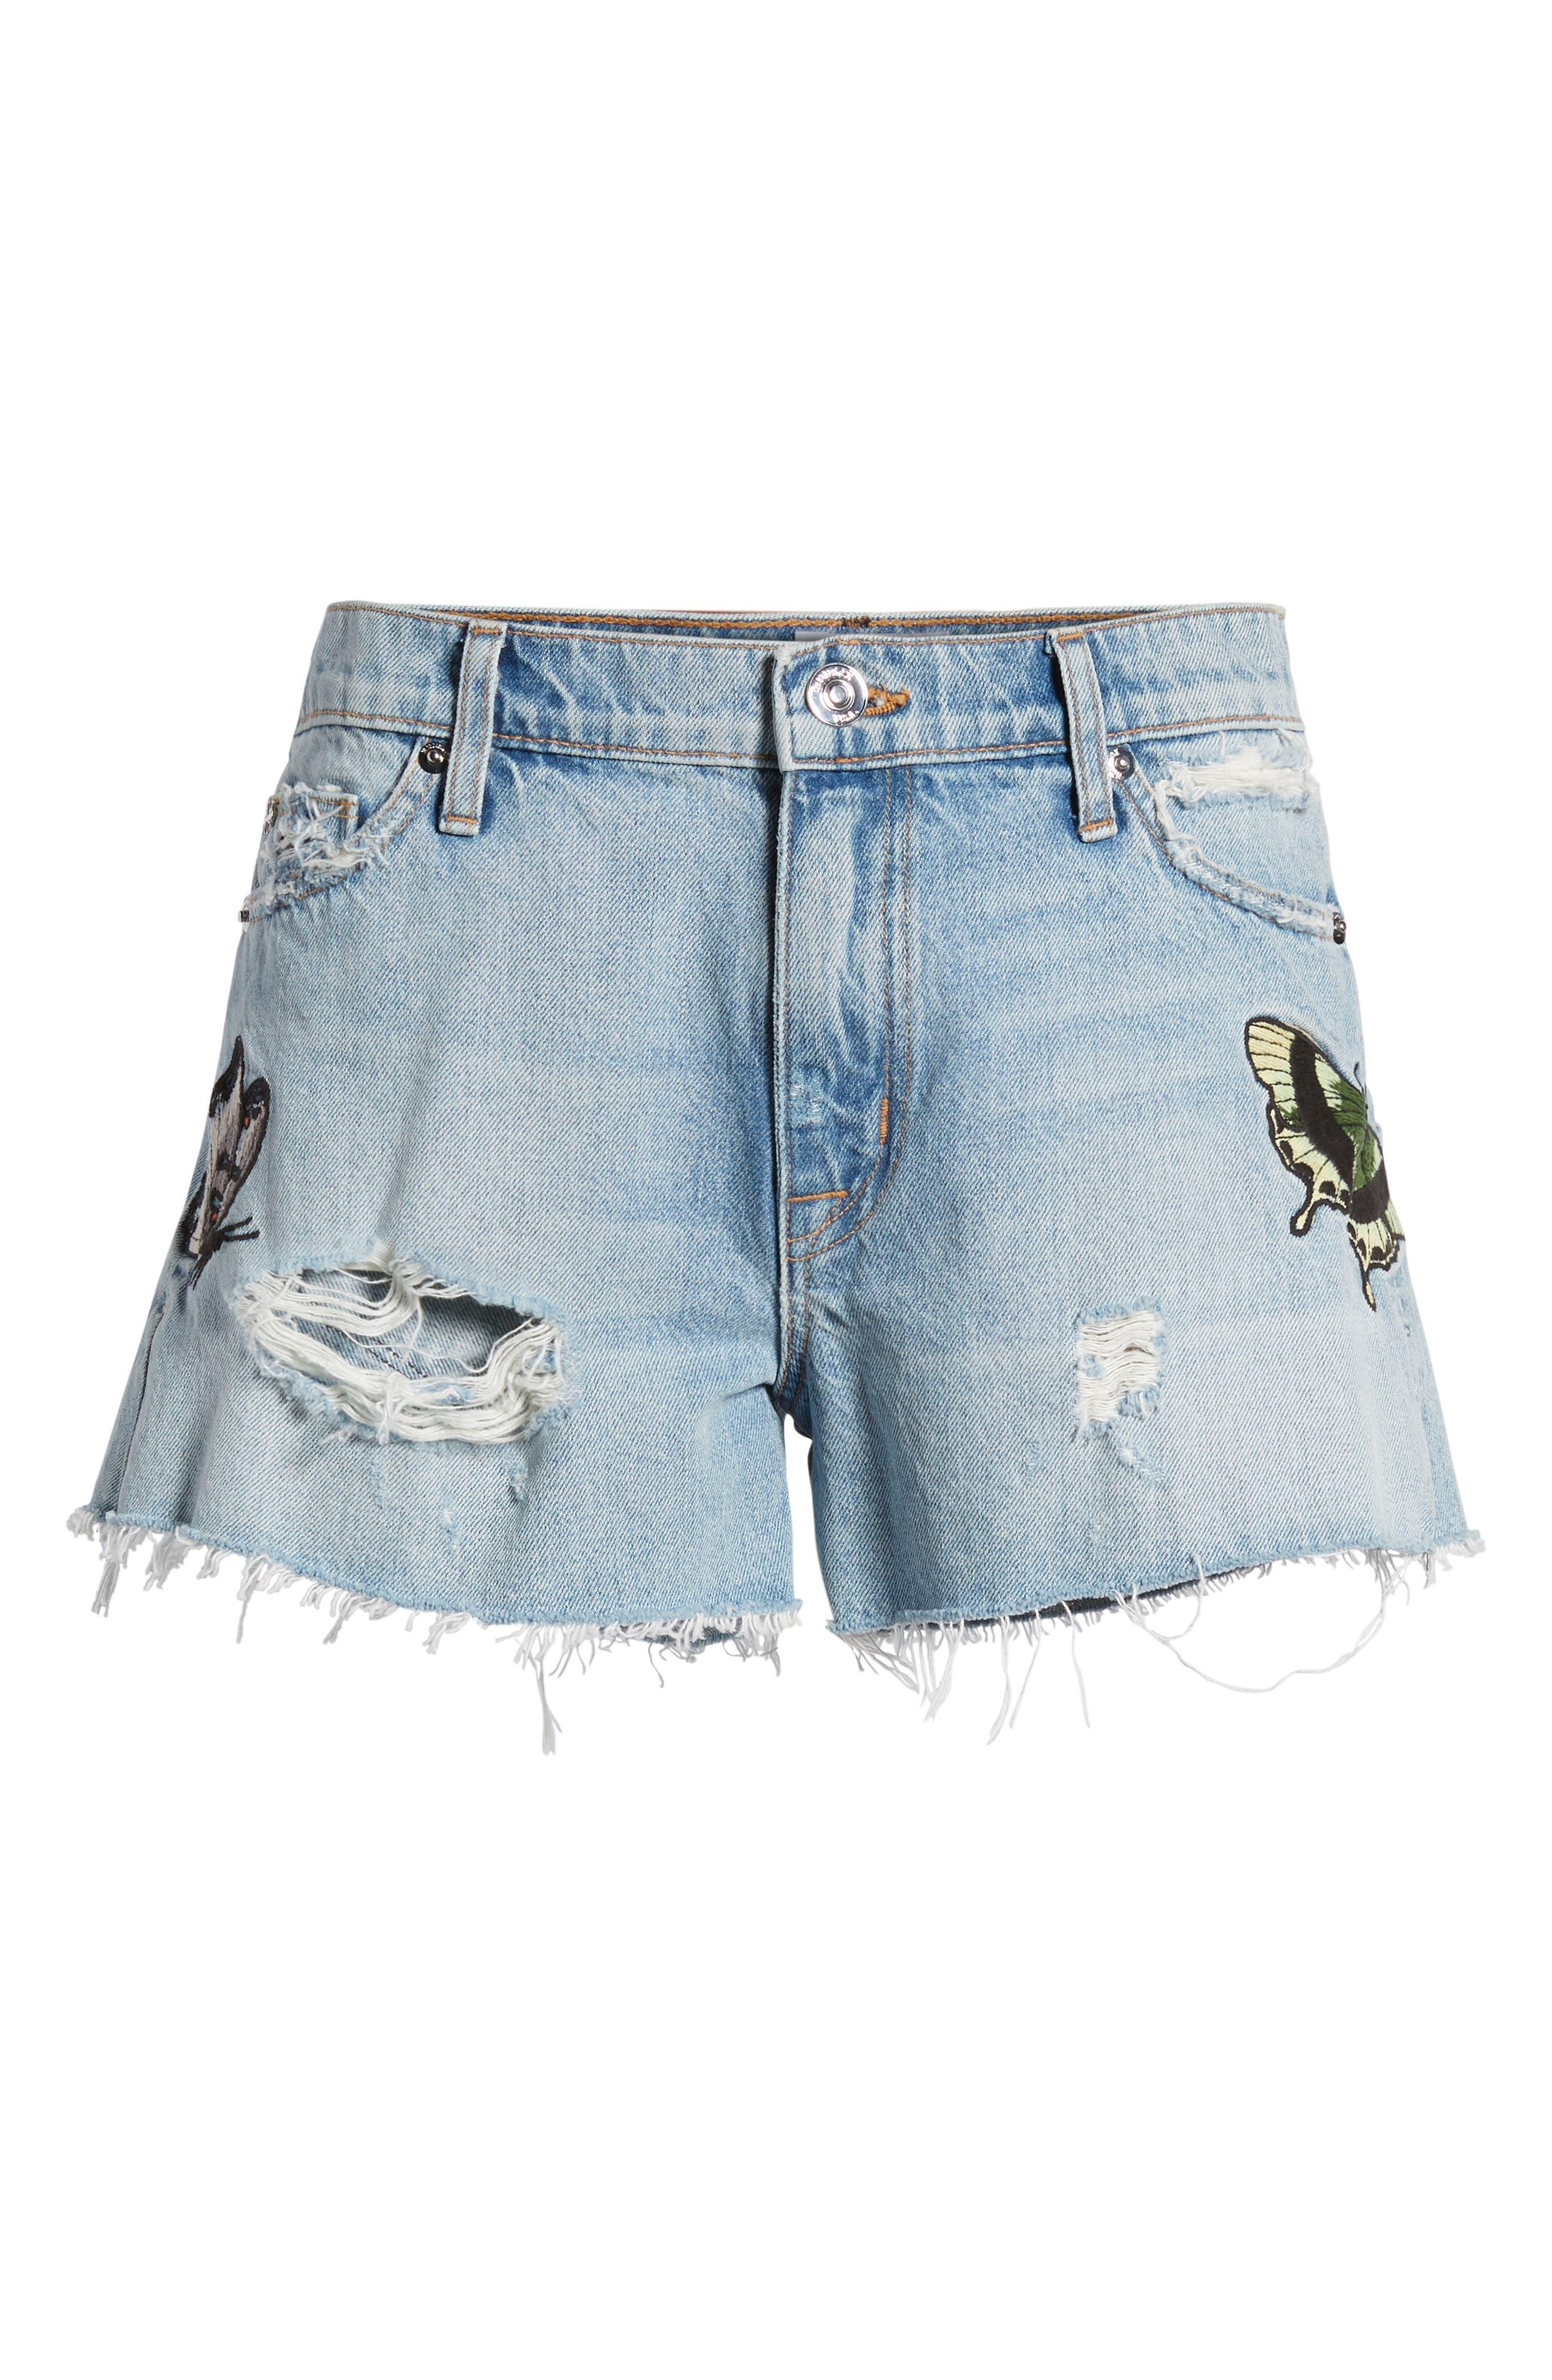 Sade Cutoff Denim Shorts,                             Alternate thumbnail 7, color,                             454